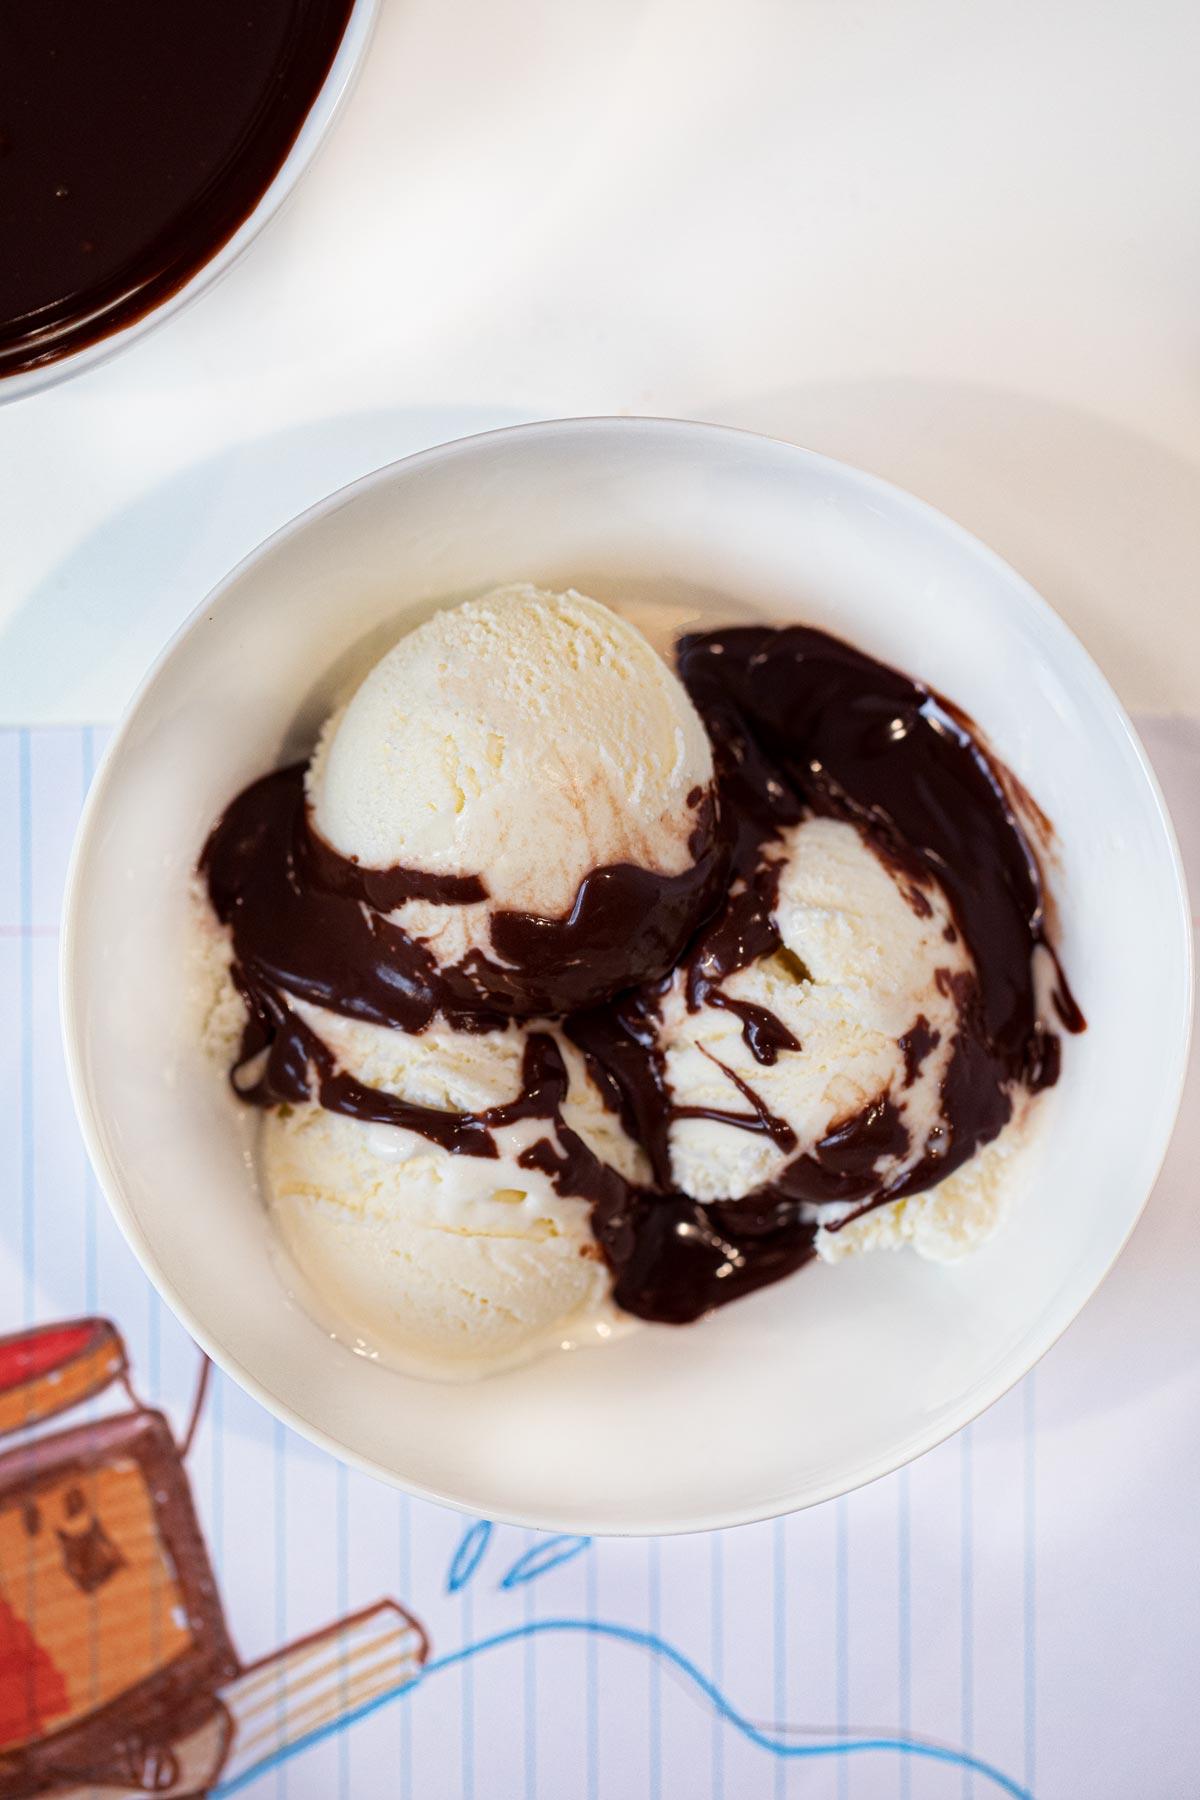 Microwave Chocolate Sauce on ice cream in bowl